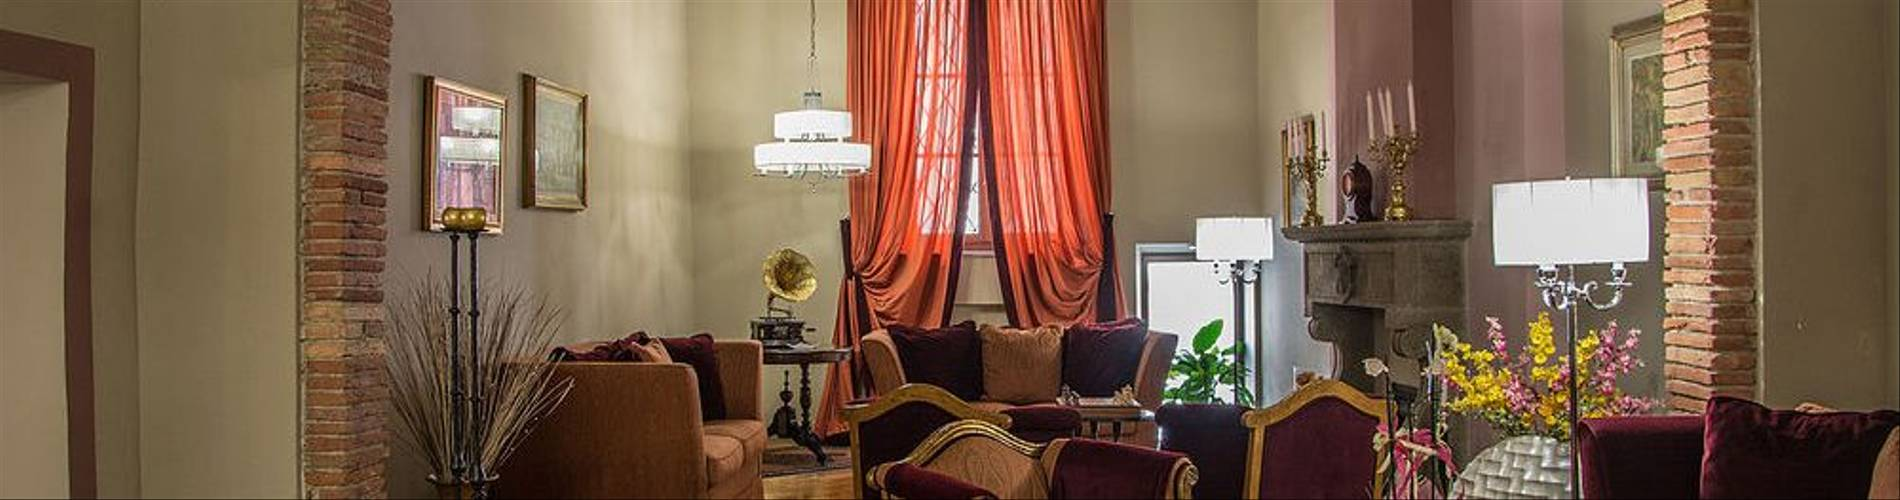 04-Hotel San Luca Palace.jpg